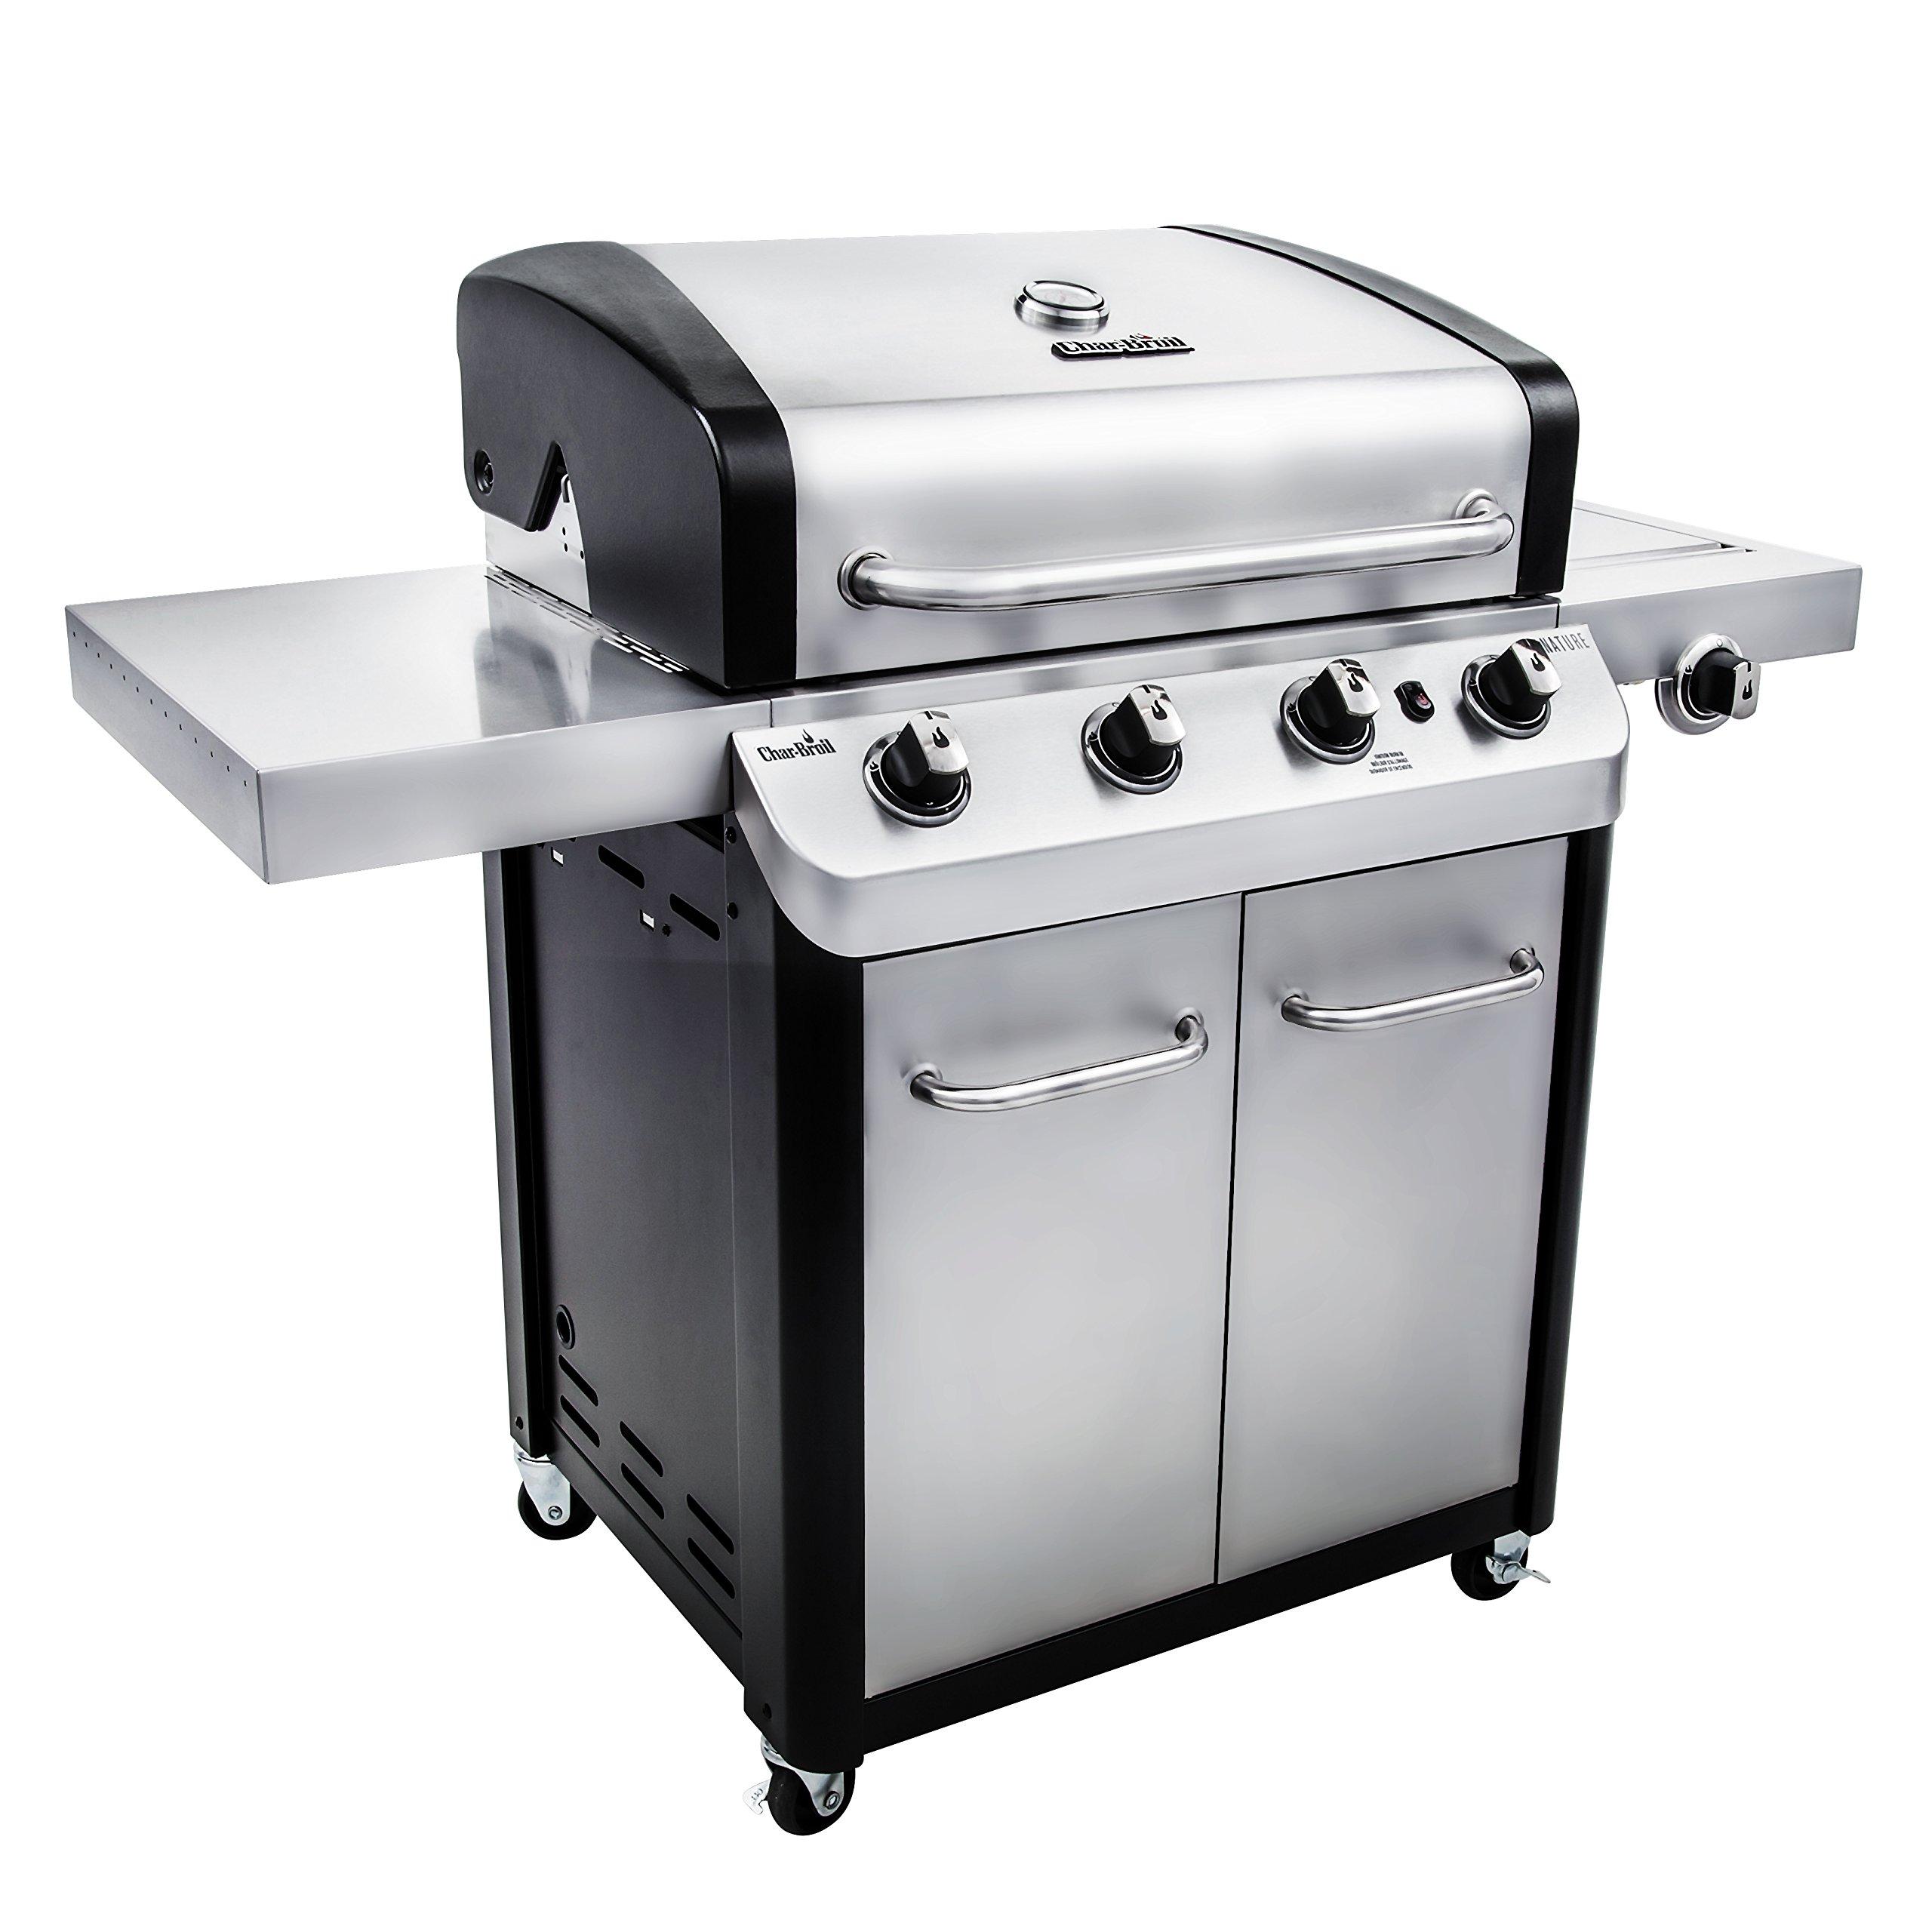 Char-Broil Signature 530 4-Burner Cabinet Liquid Propane Gas Grill